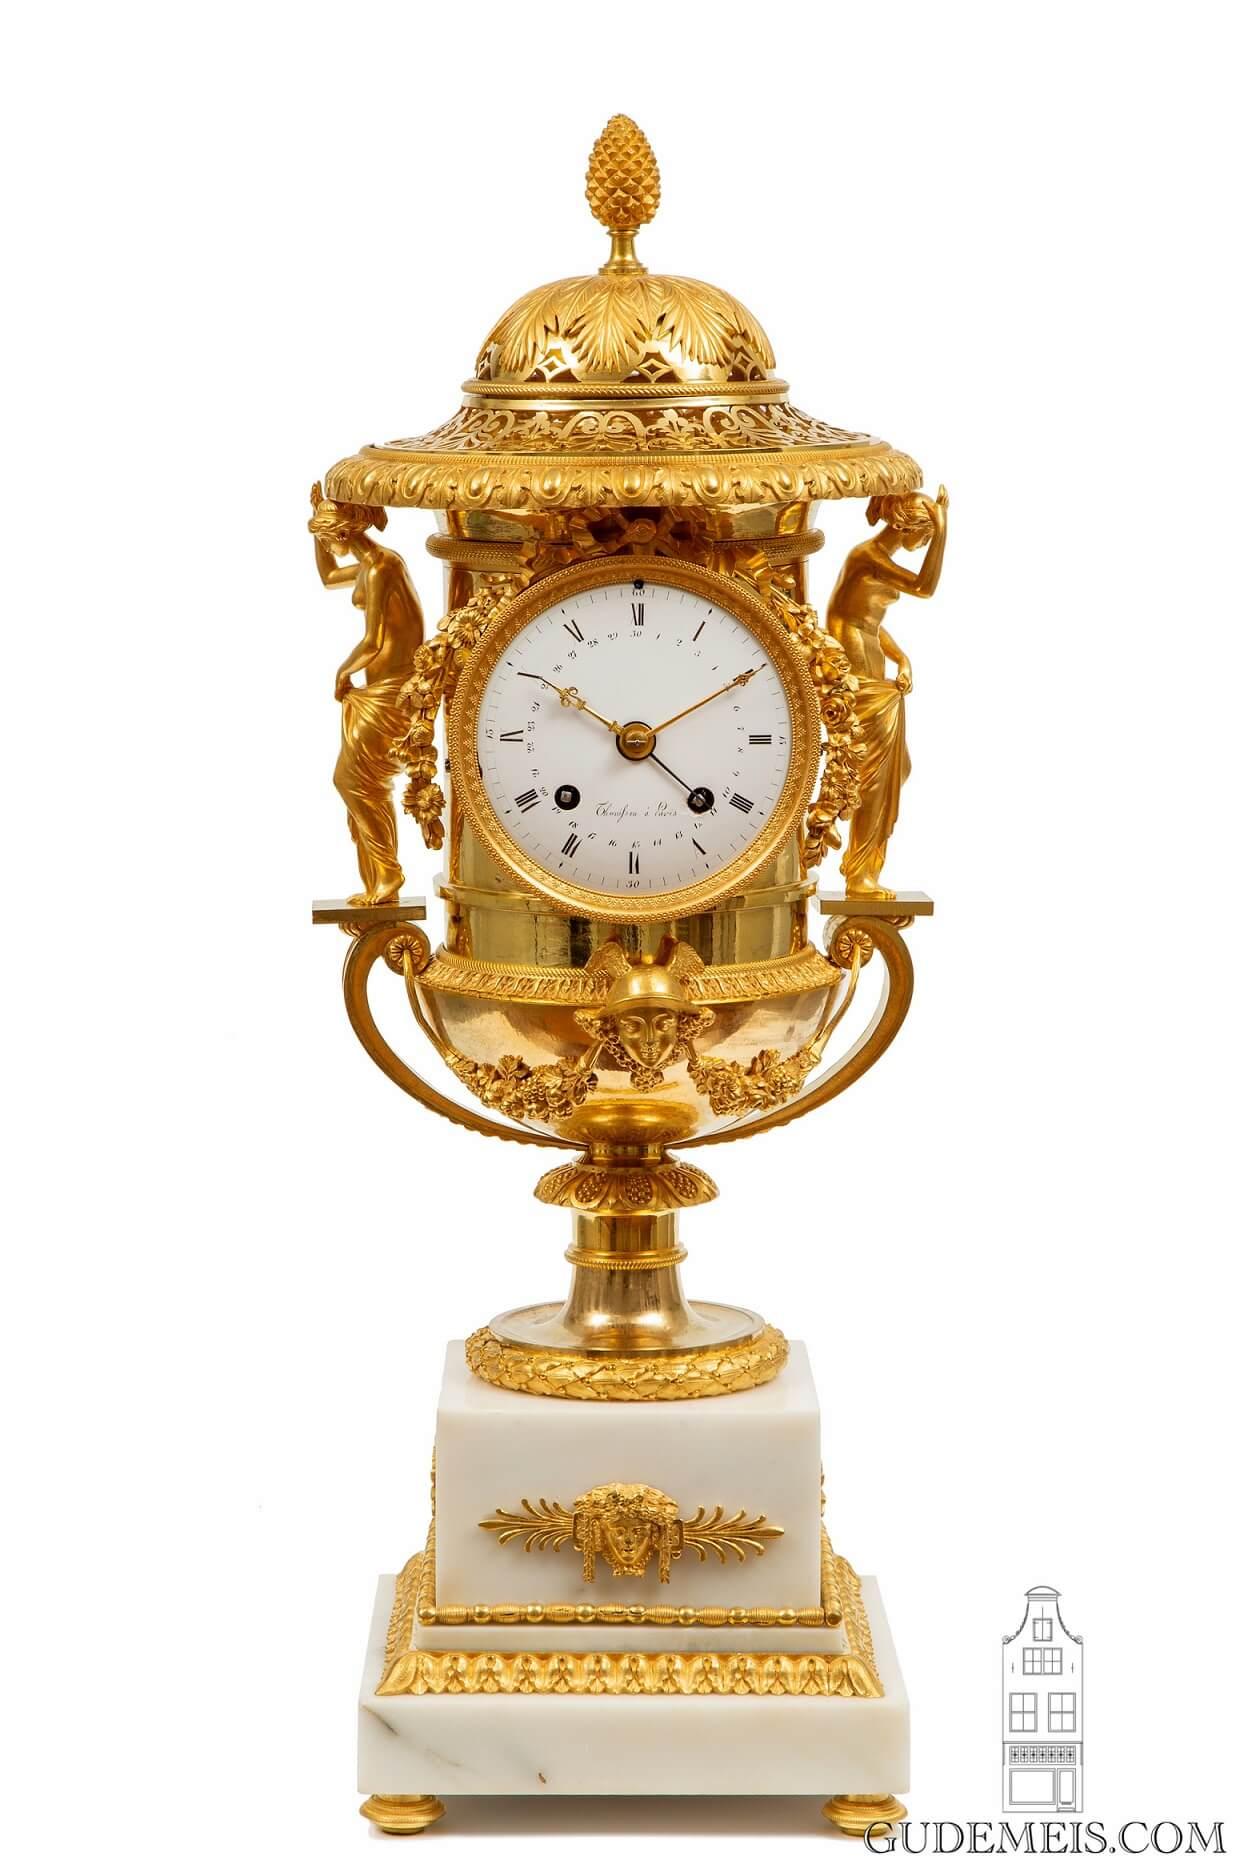 French-empire-gilt-bronze-ormolu-urn-striking-mantel-antique-clock-thomire-medici-paris